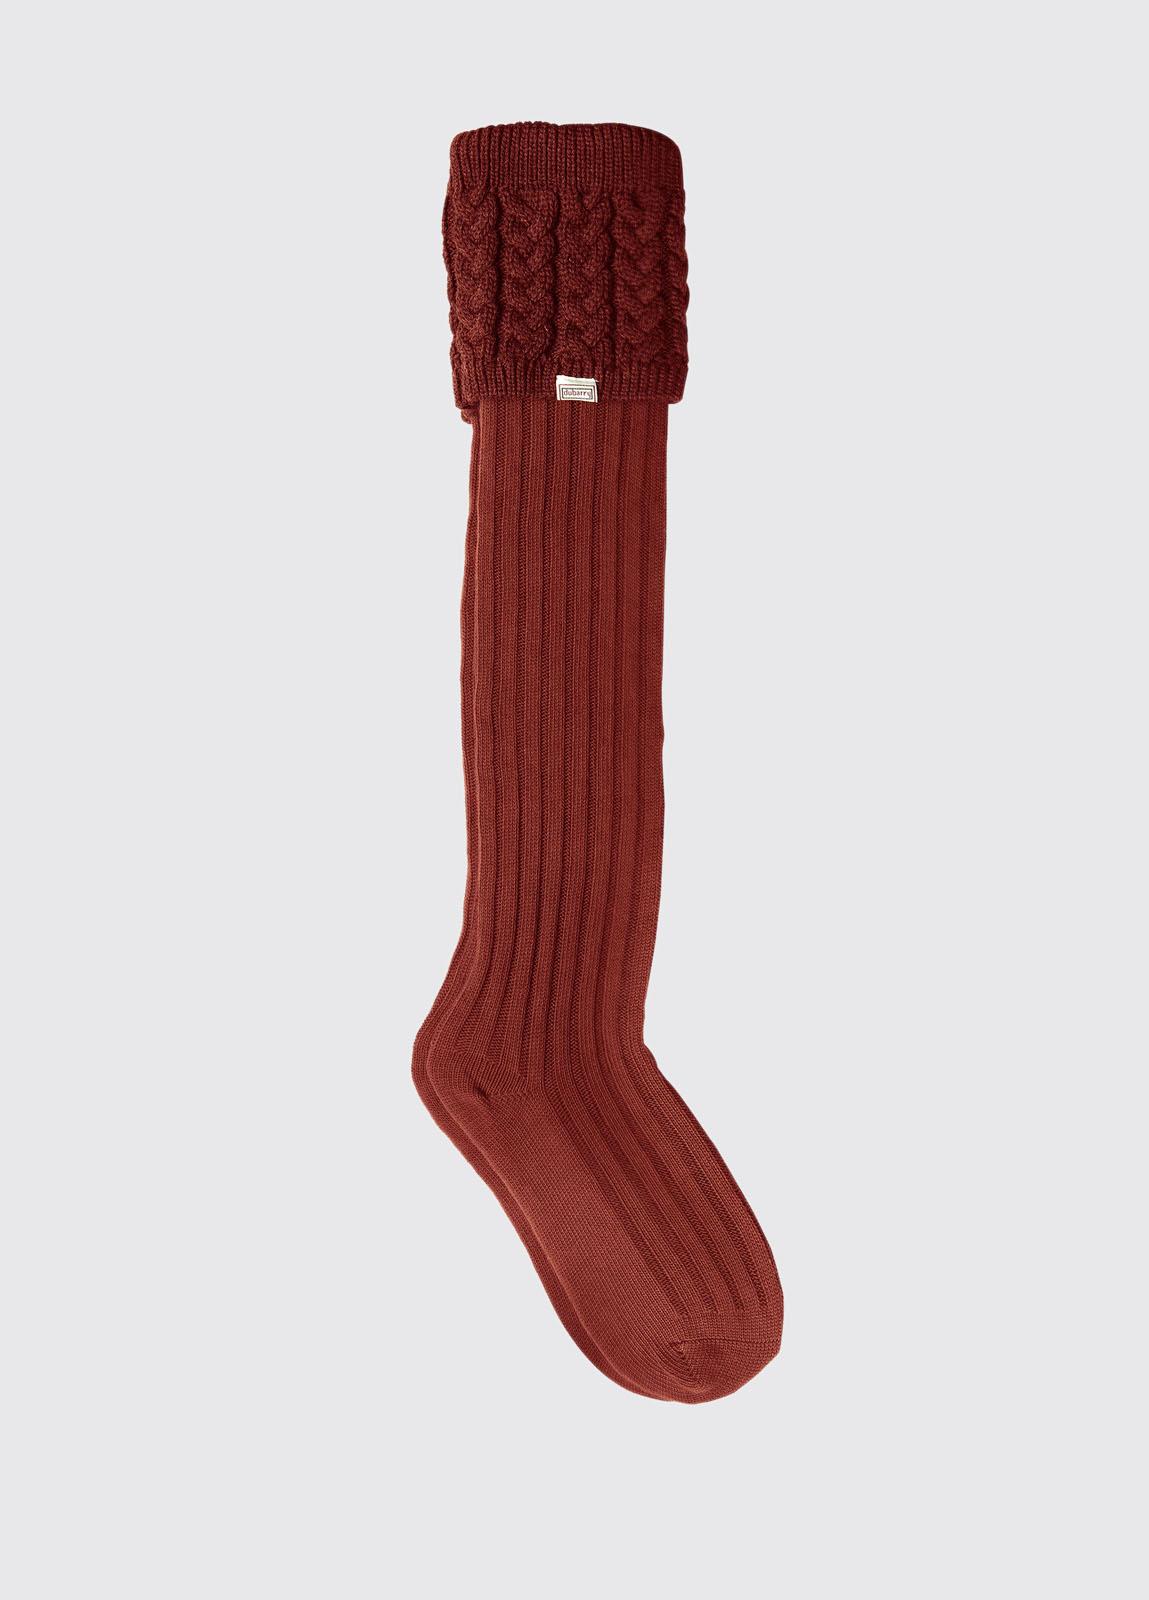 Trinity Socks - Merlot